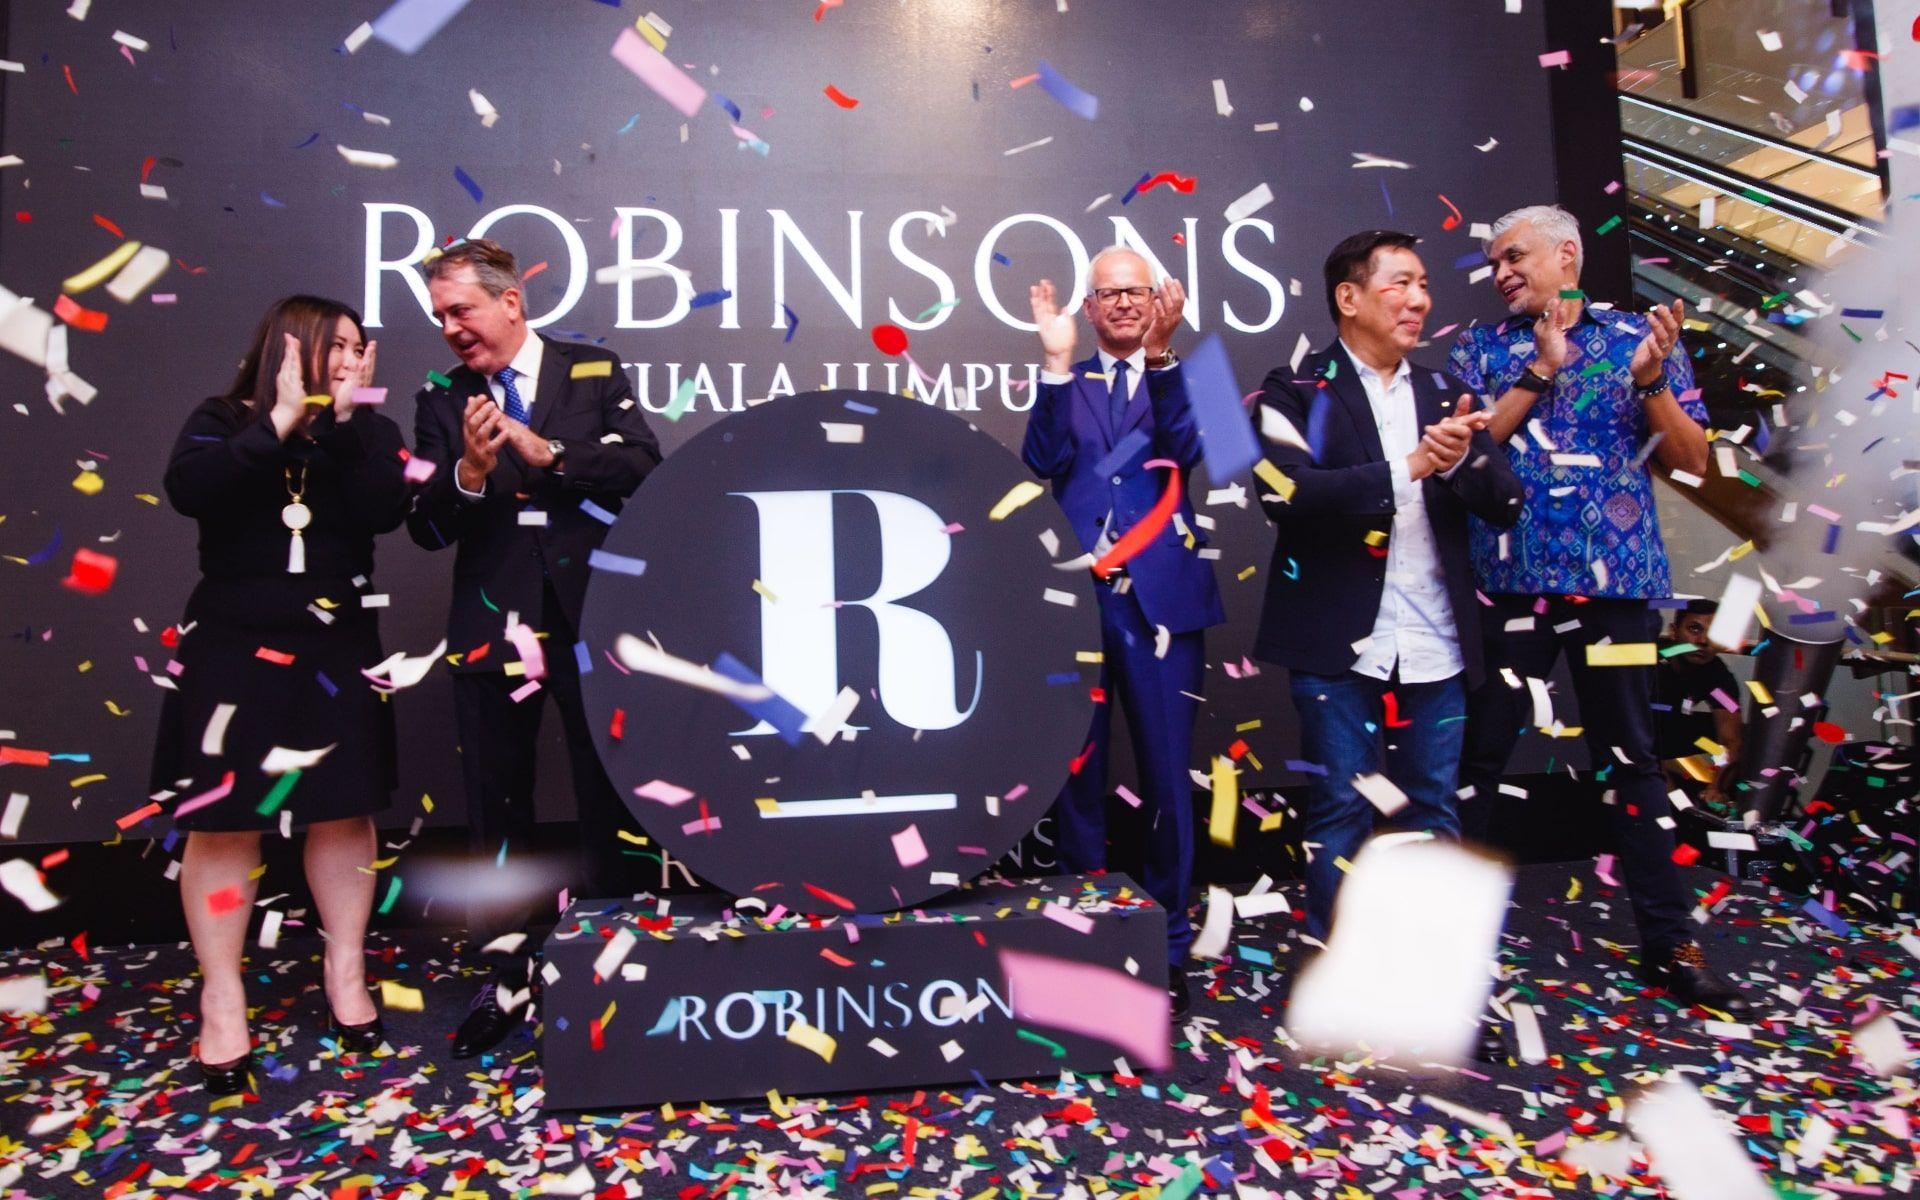 Ashley Tang, Christophe Cann, Paul Delaoutre, Datuk David Ban and Zahir Kelvin Ong